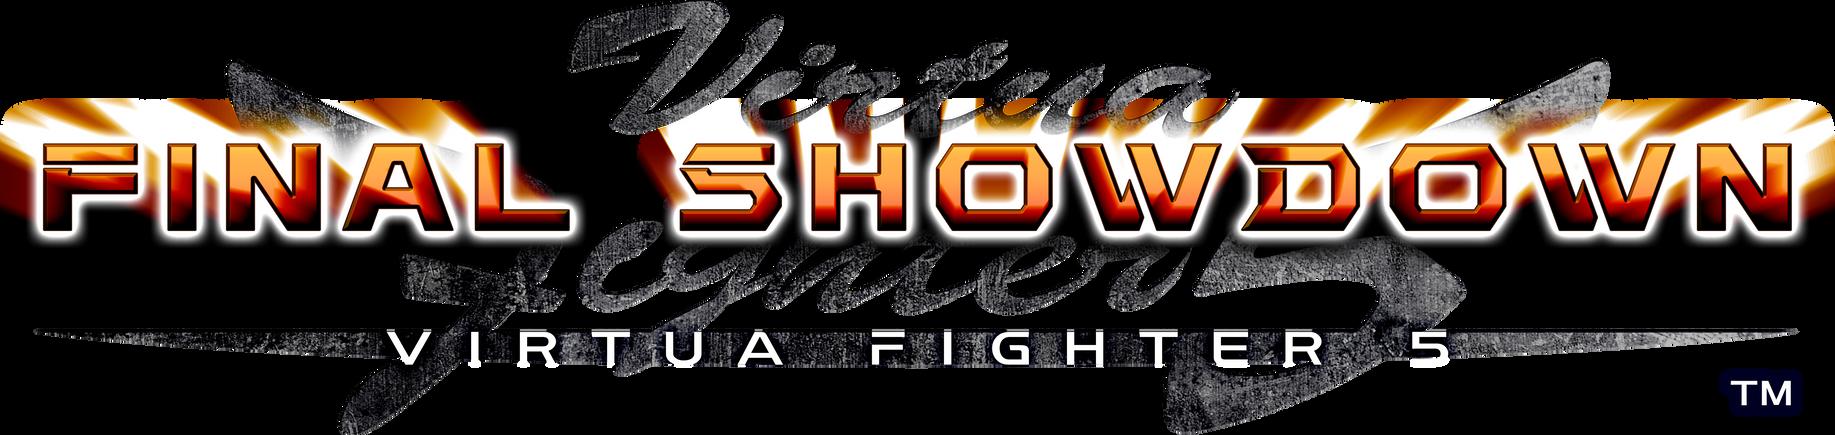 Virtua Fighter 5 Final Showdown Models (WIP)